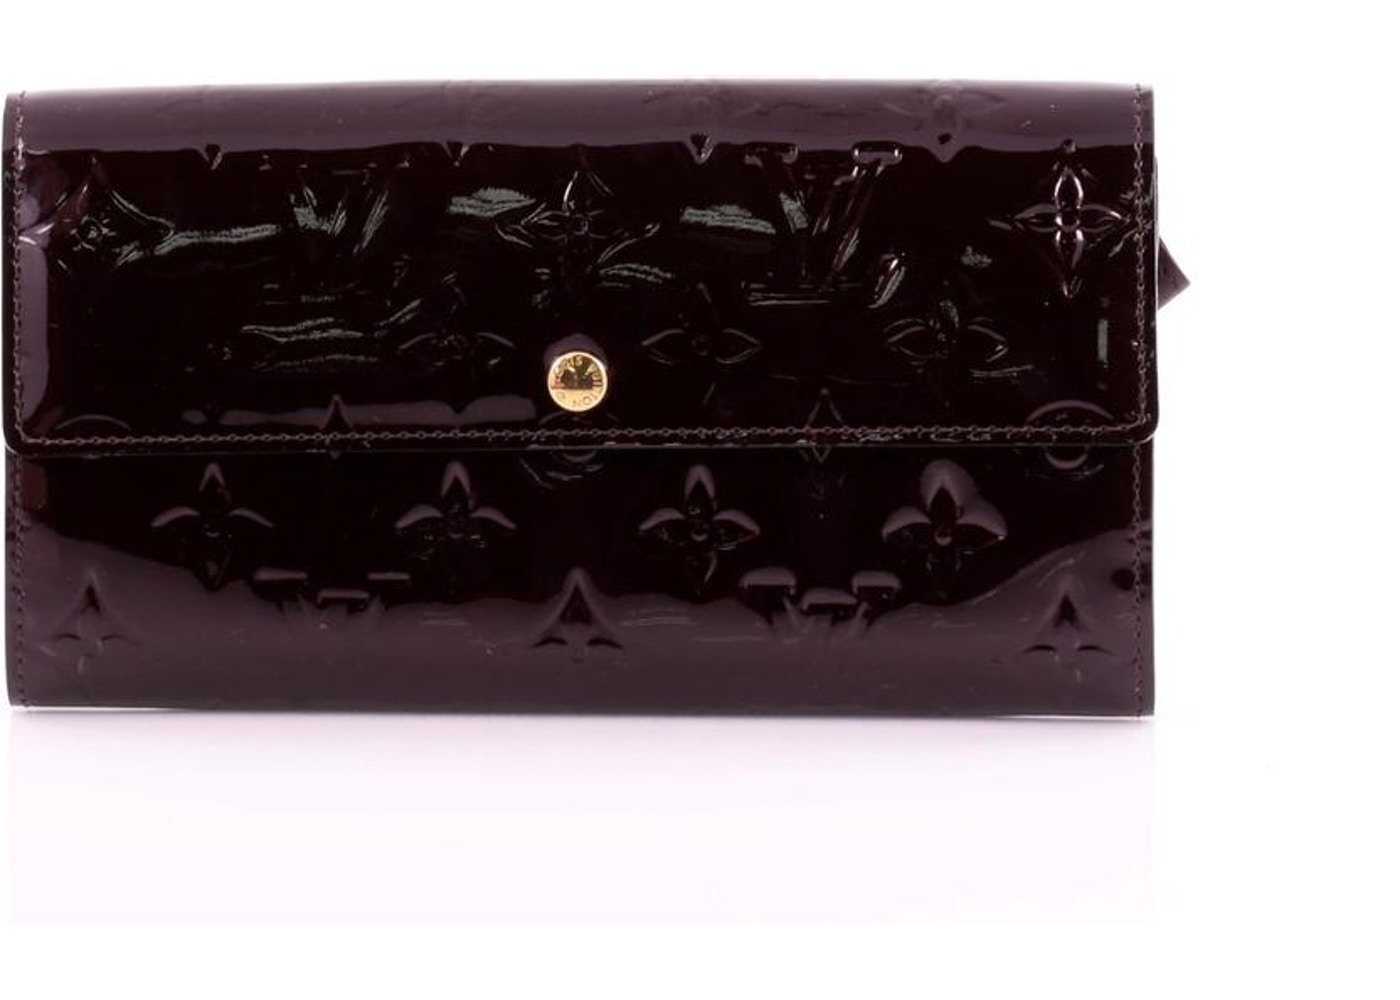 9f0e2f678434 Louis Vuitton Wallet Sarah Monogram Vernis Amarante. Monogram Vernis  Amarante